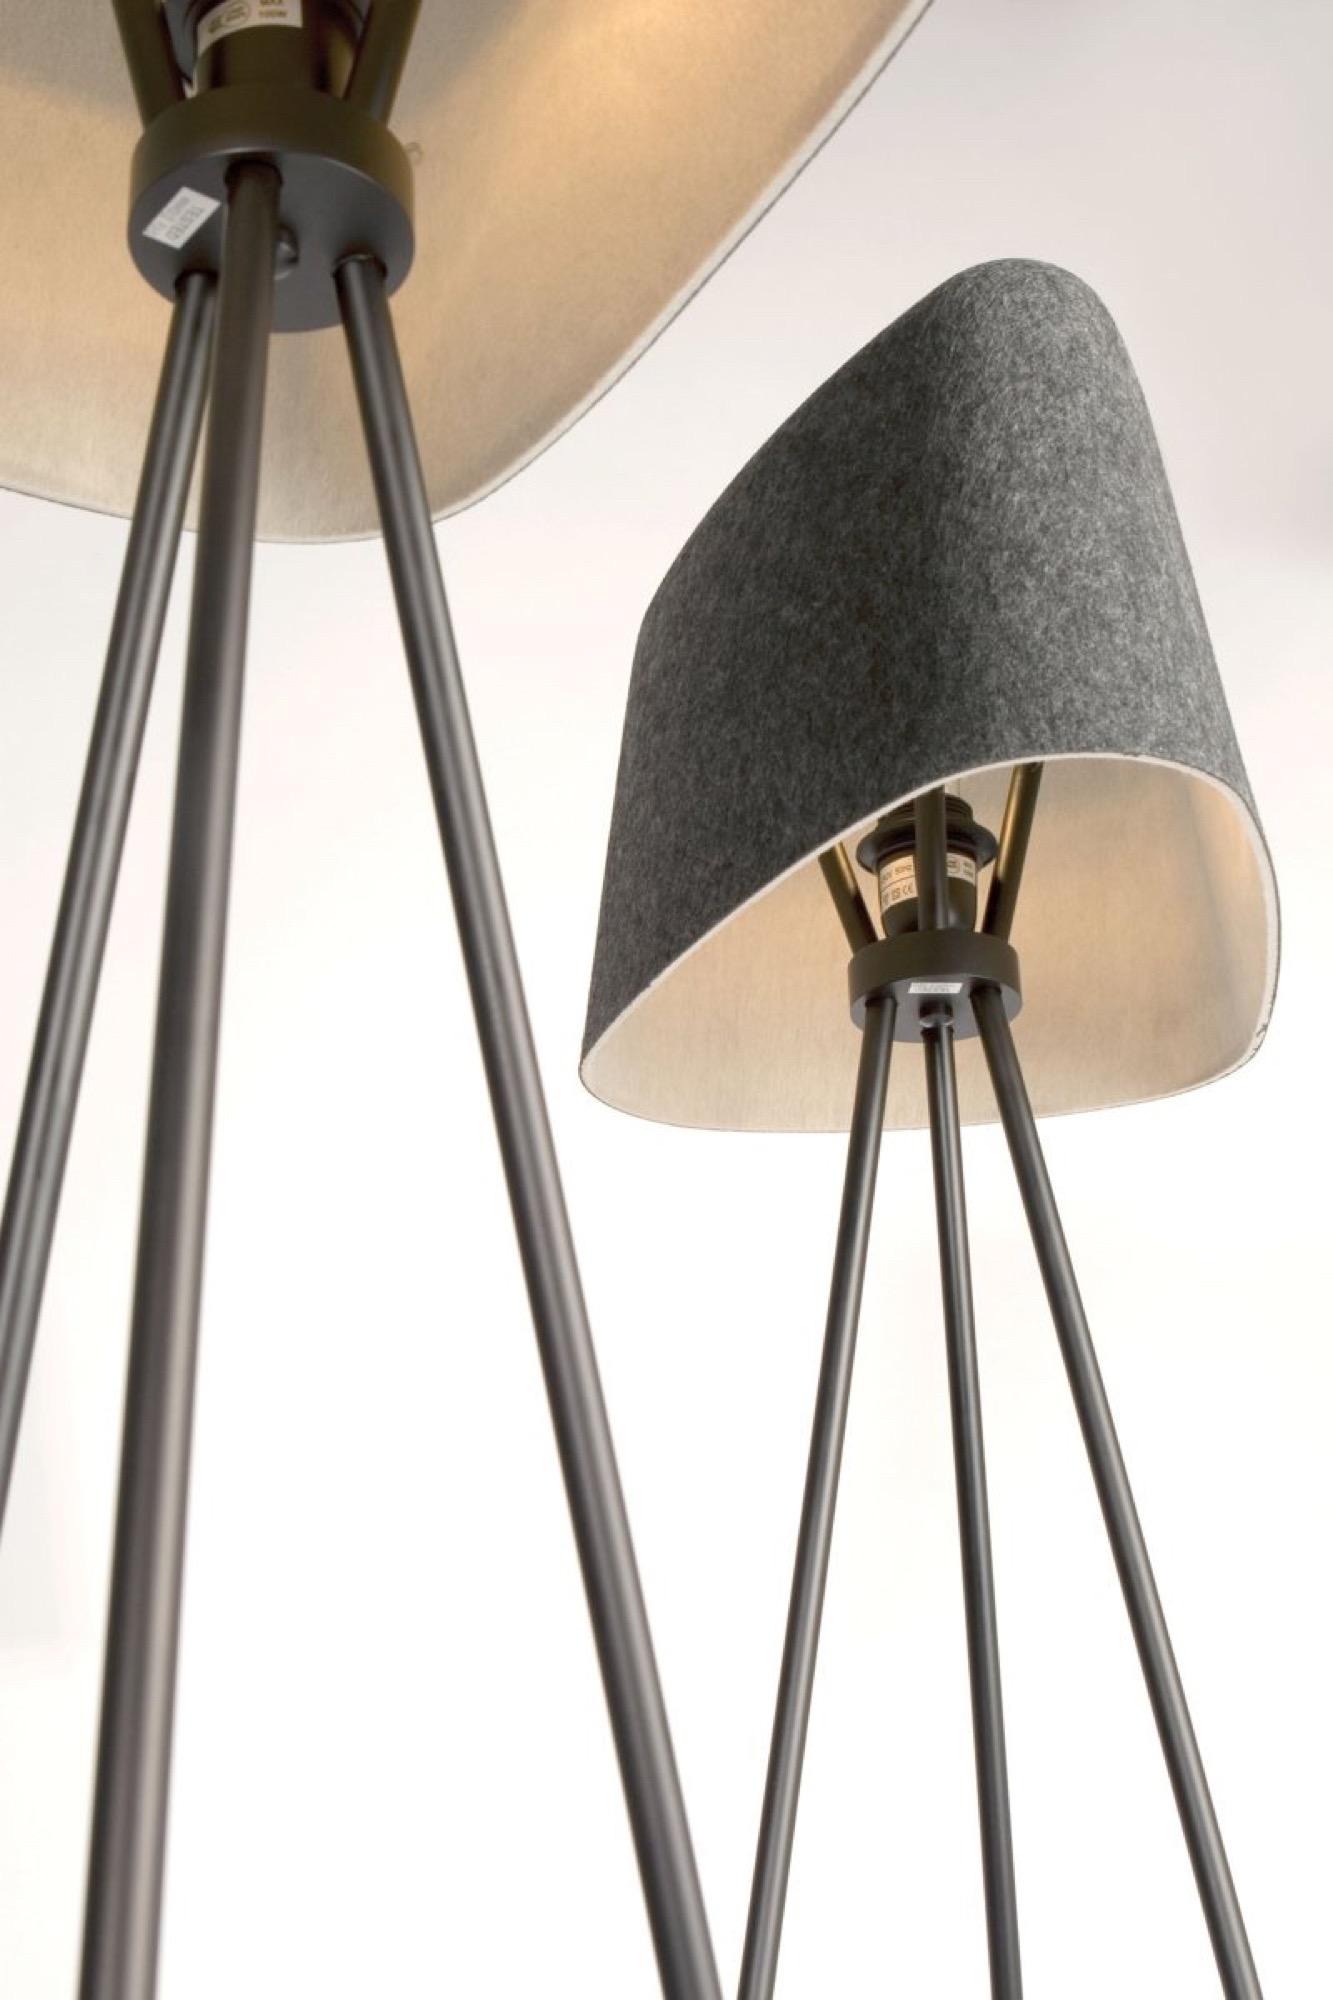 Felt Standing Lamp by Tom Dixon